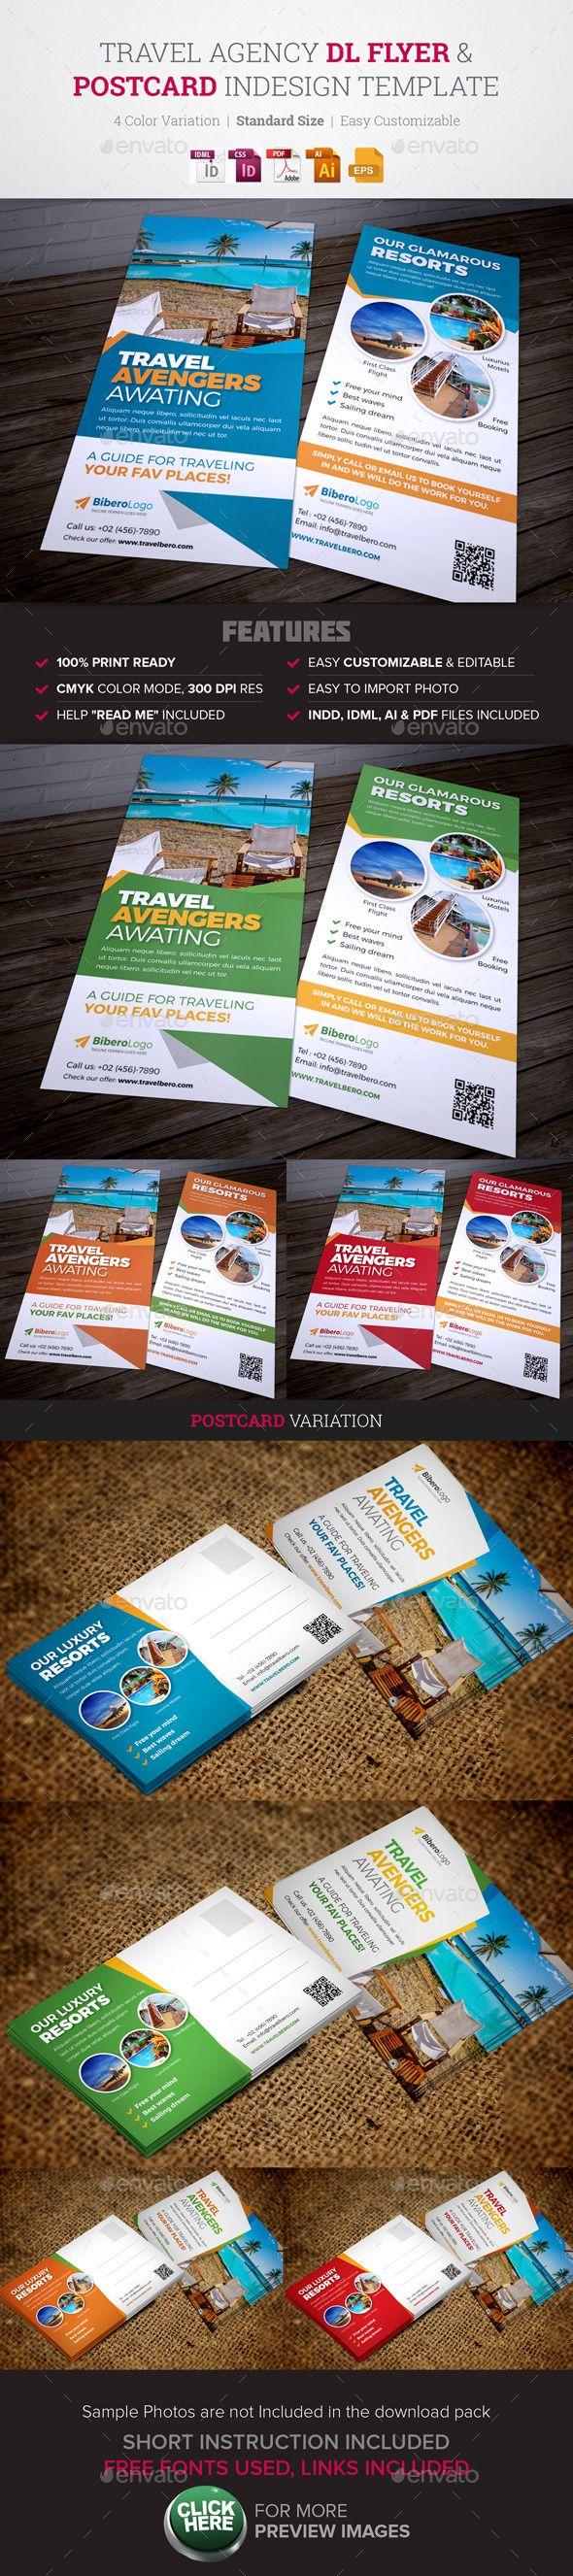 Travel Agency DL Flyer & Postcard InDesign | Diseño editorial ...